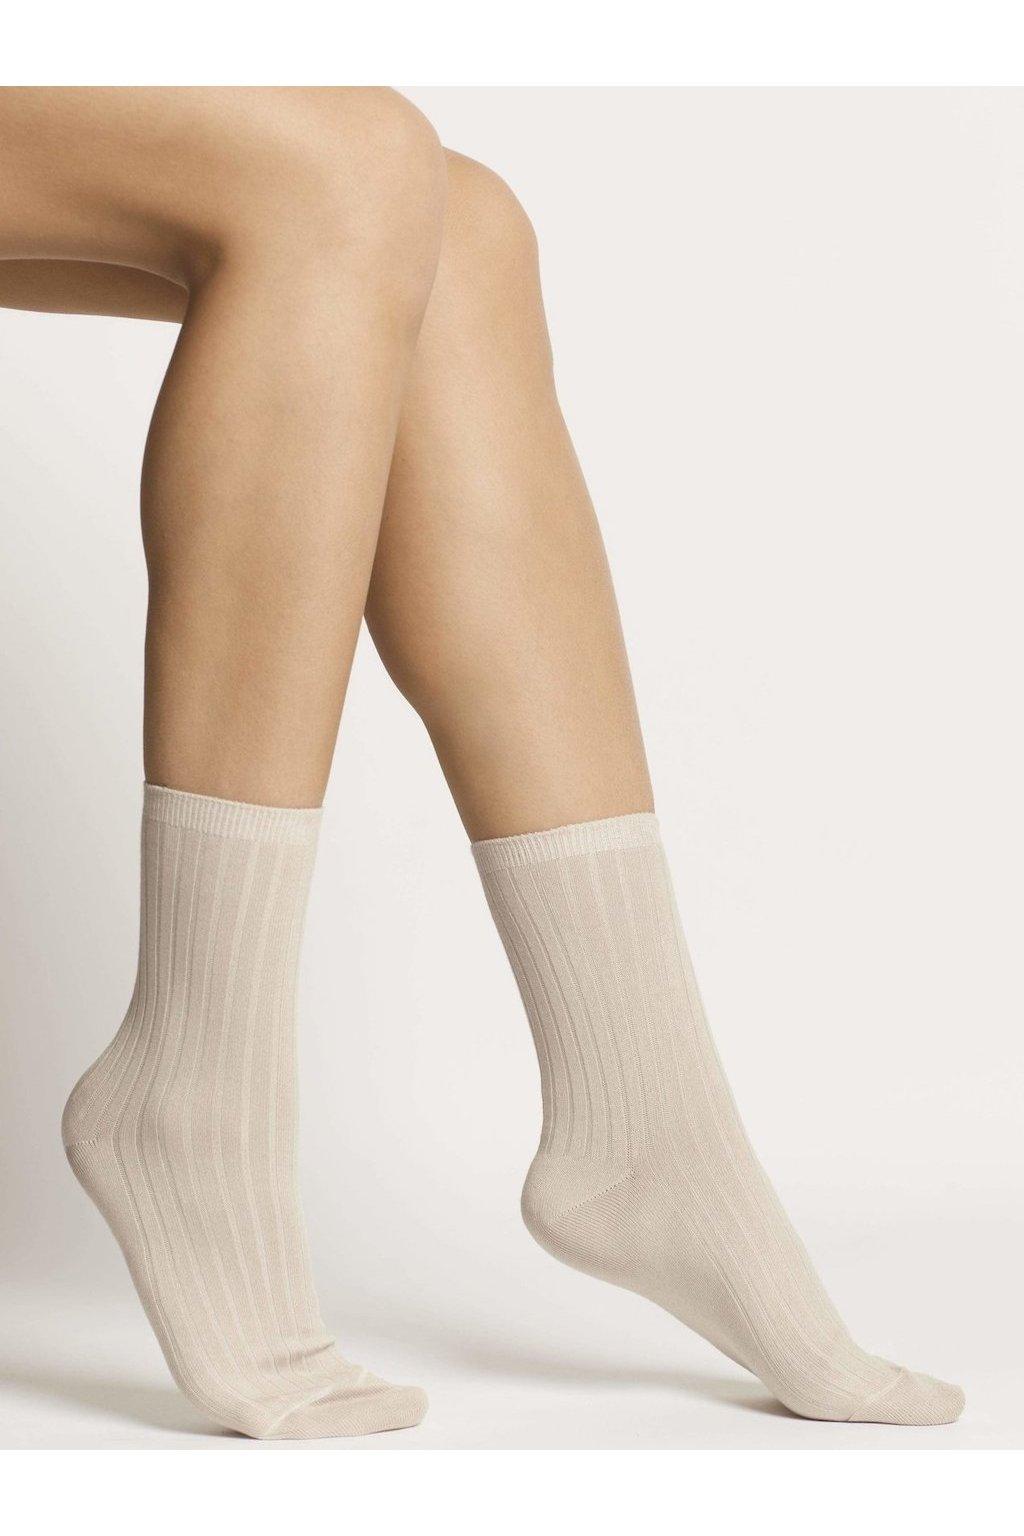 organic cotton socks dusty rose 539347 1800x1800